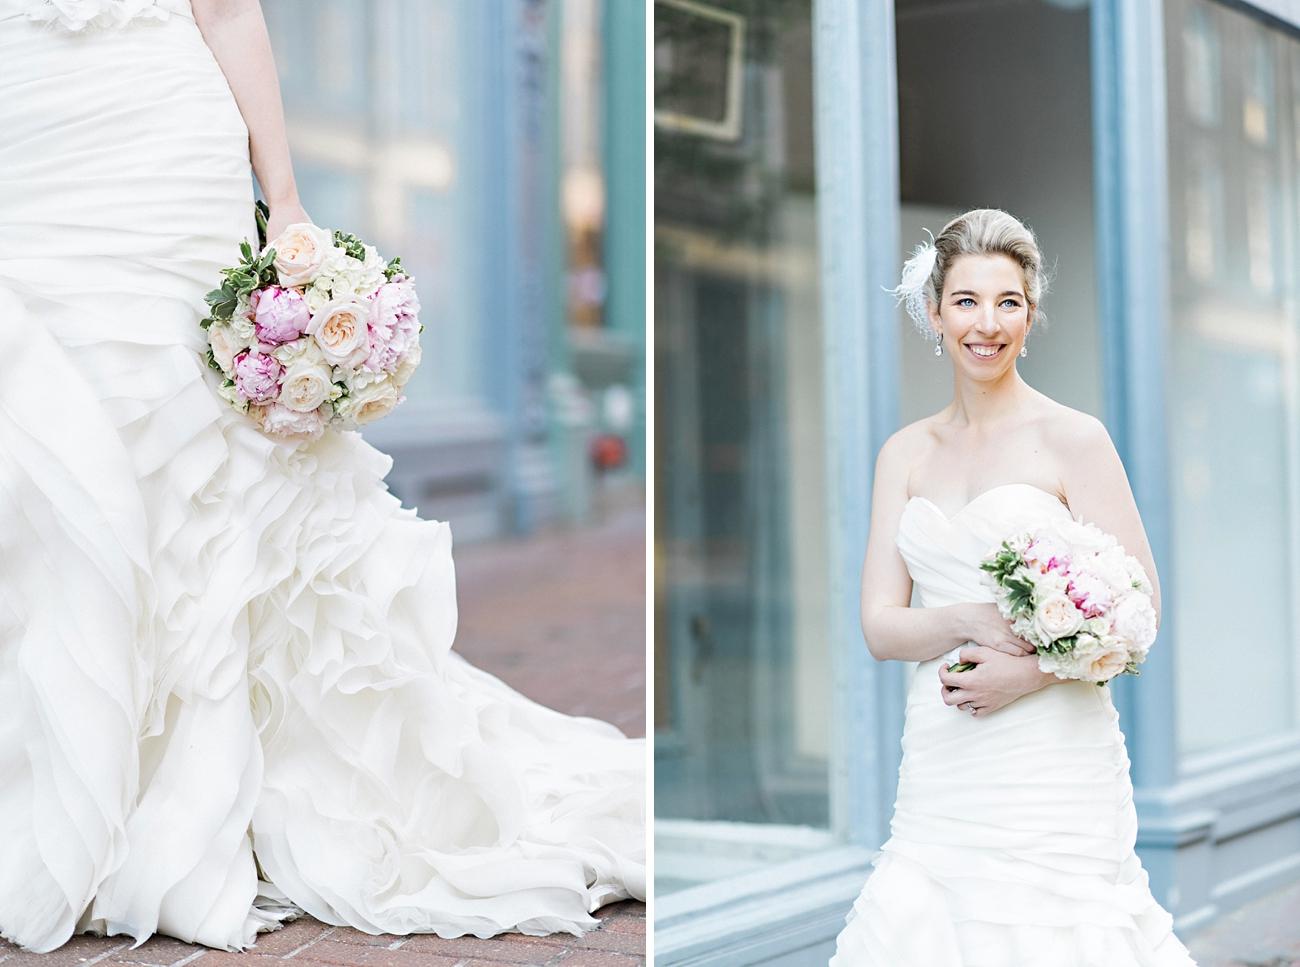 Sara-Seans-Halifax-Prince-George-Hotel-Wedding053.jpg